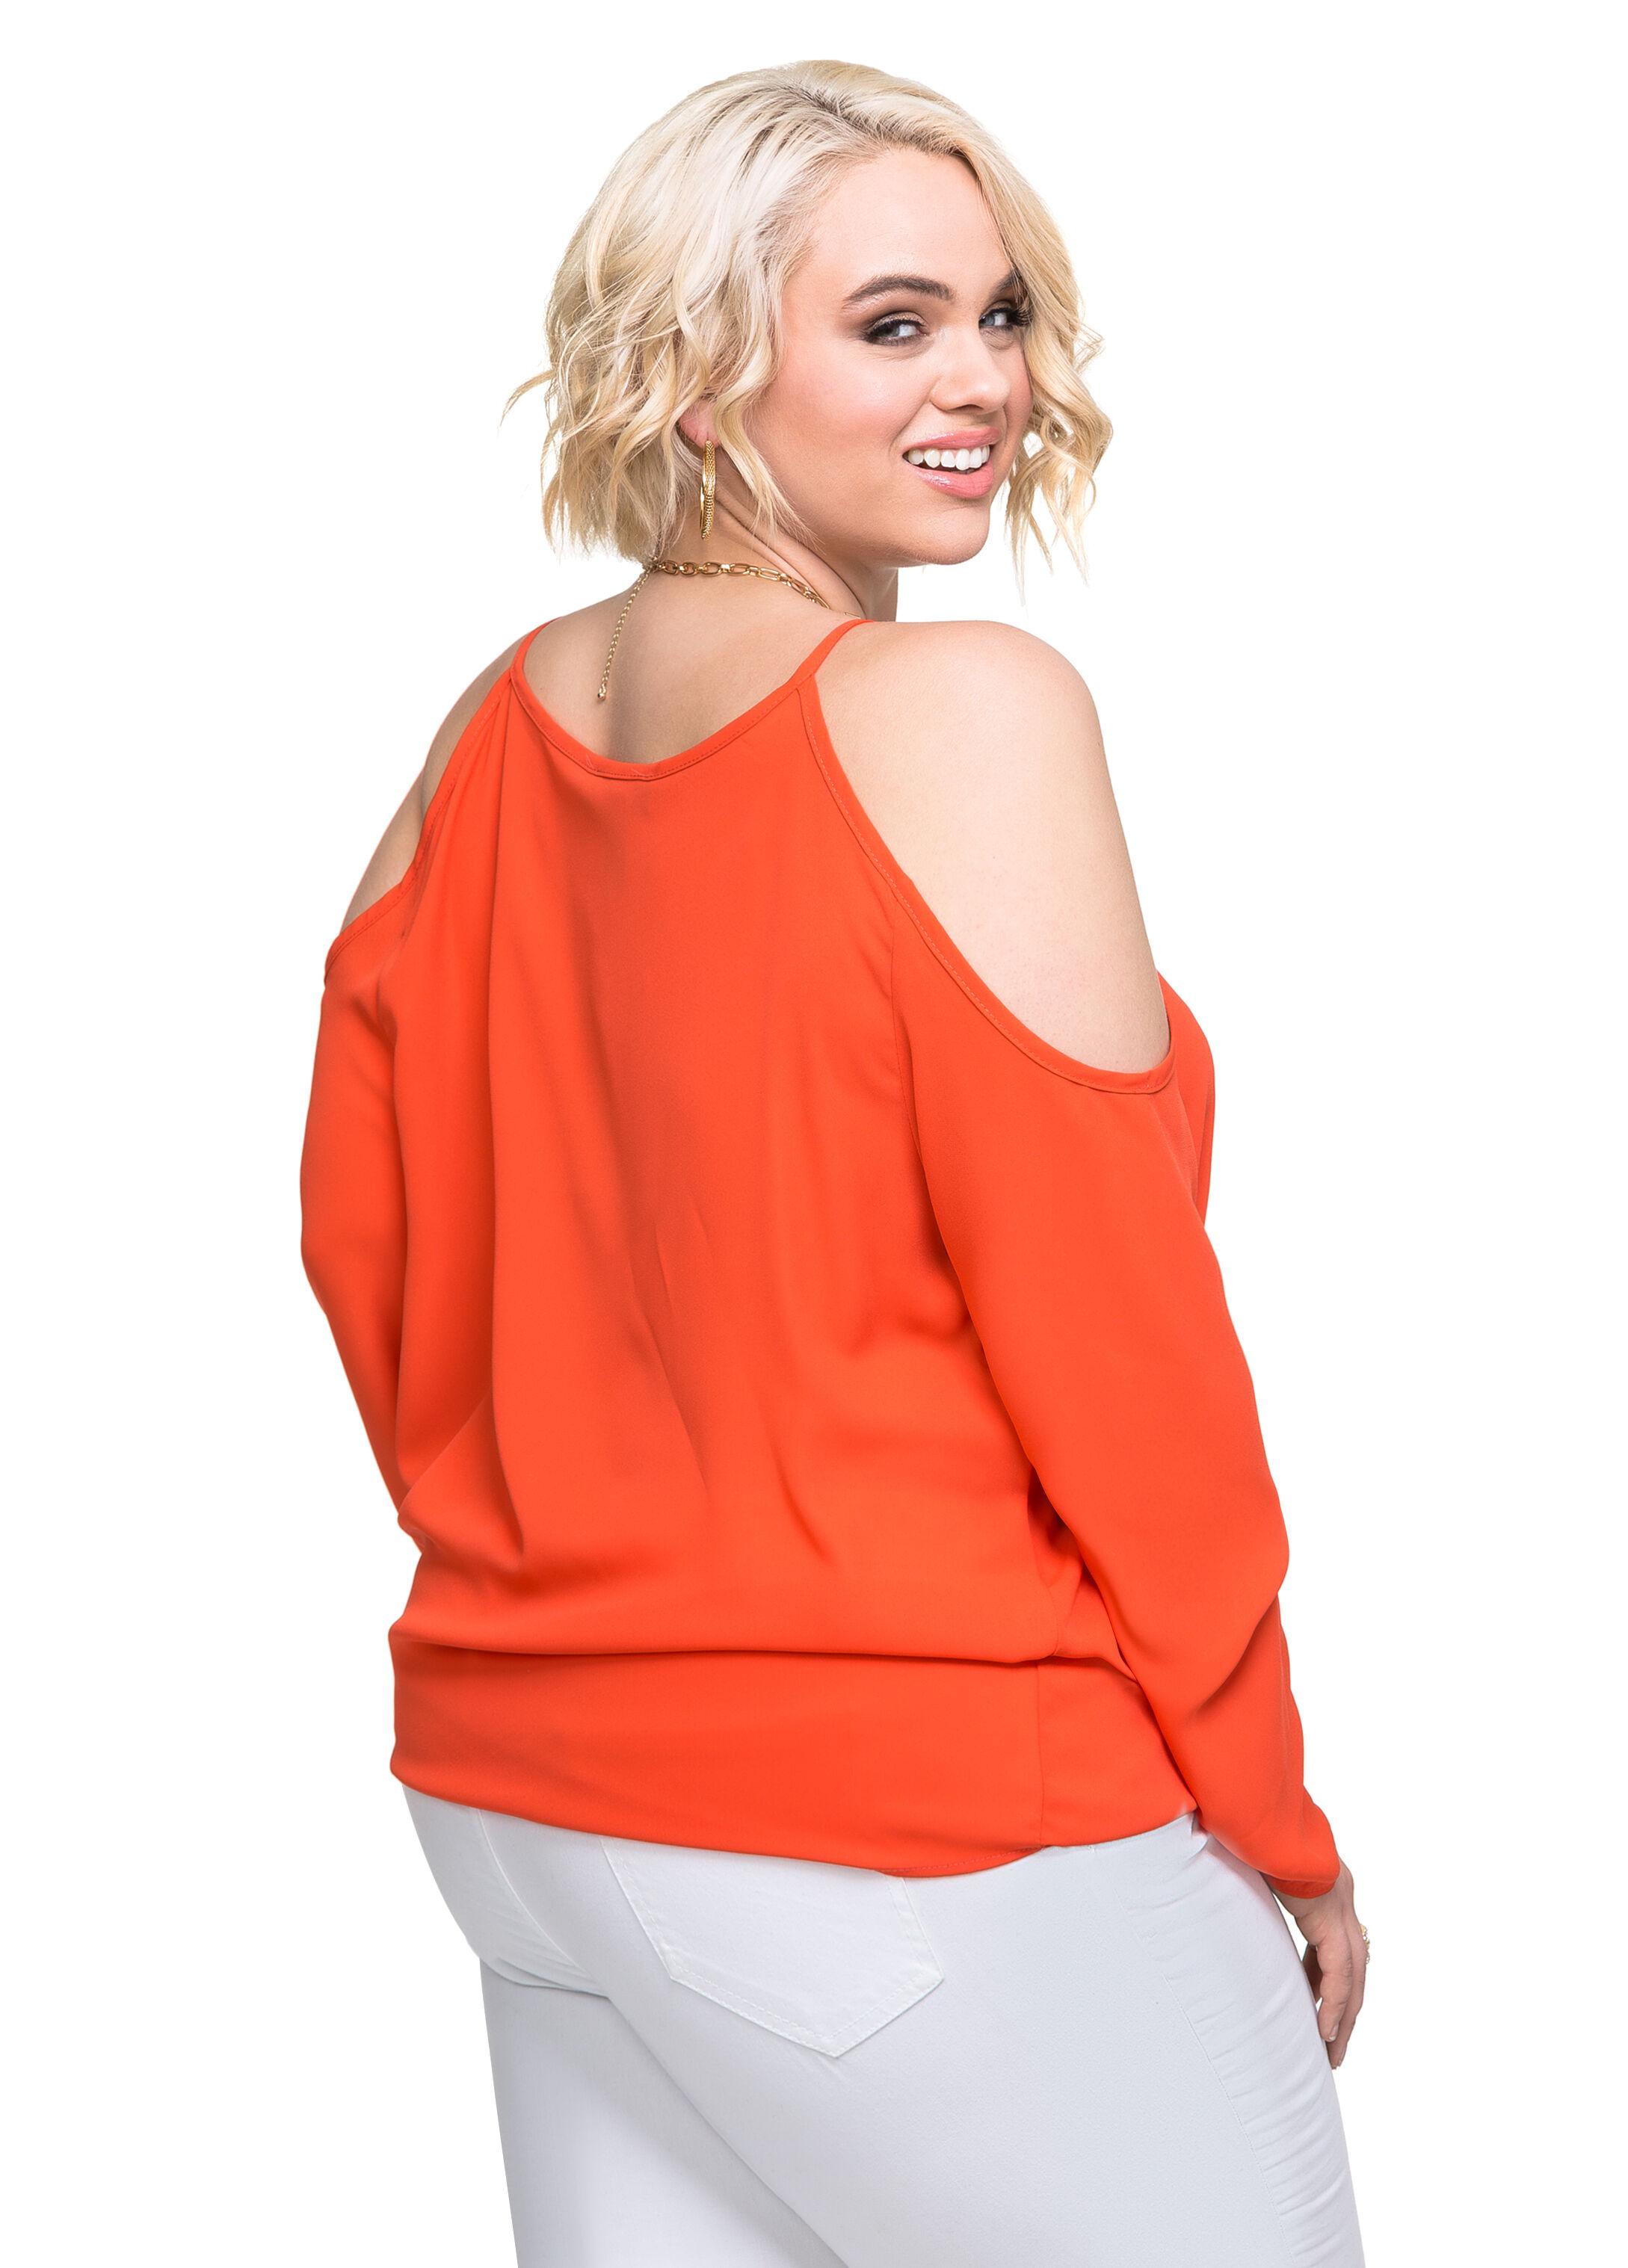 surplice cold shoulder blouse plus size tops ashley stewart. Black Bedroom Furniture Sets. Home Design Ideas